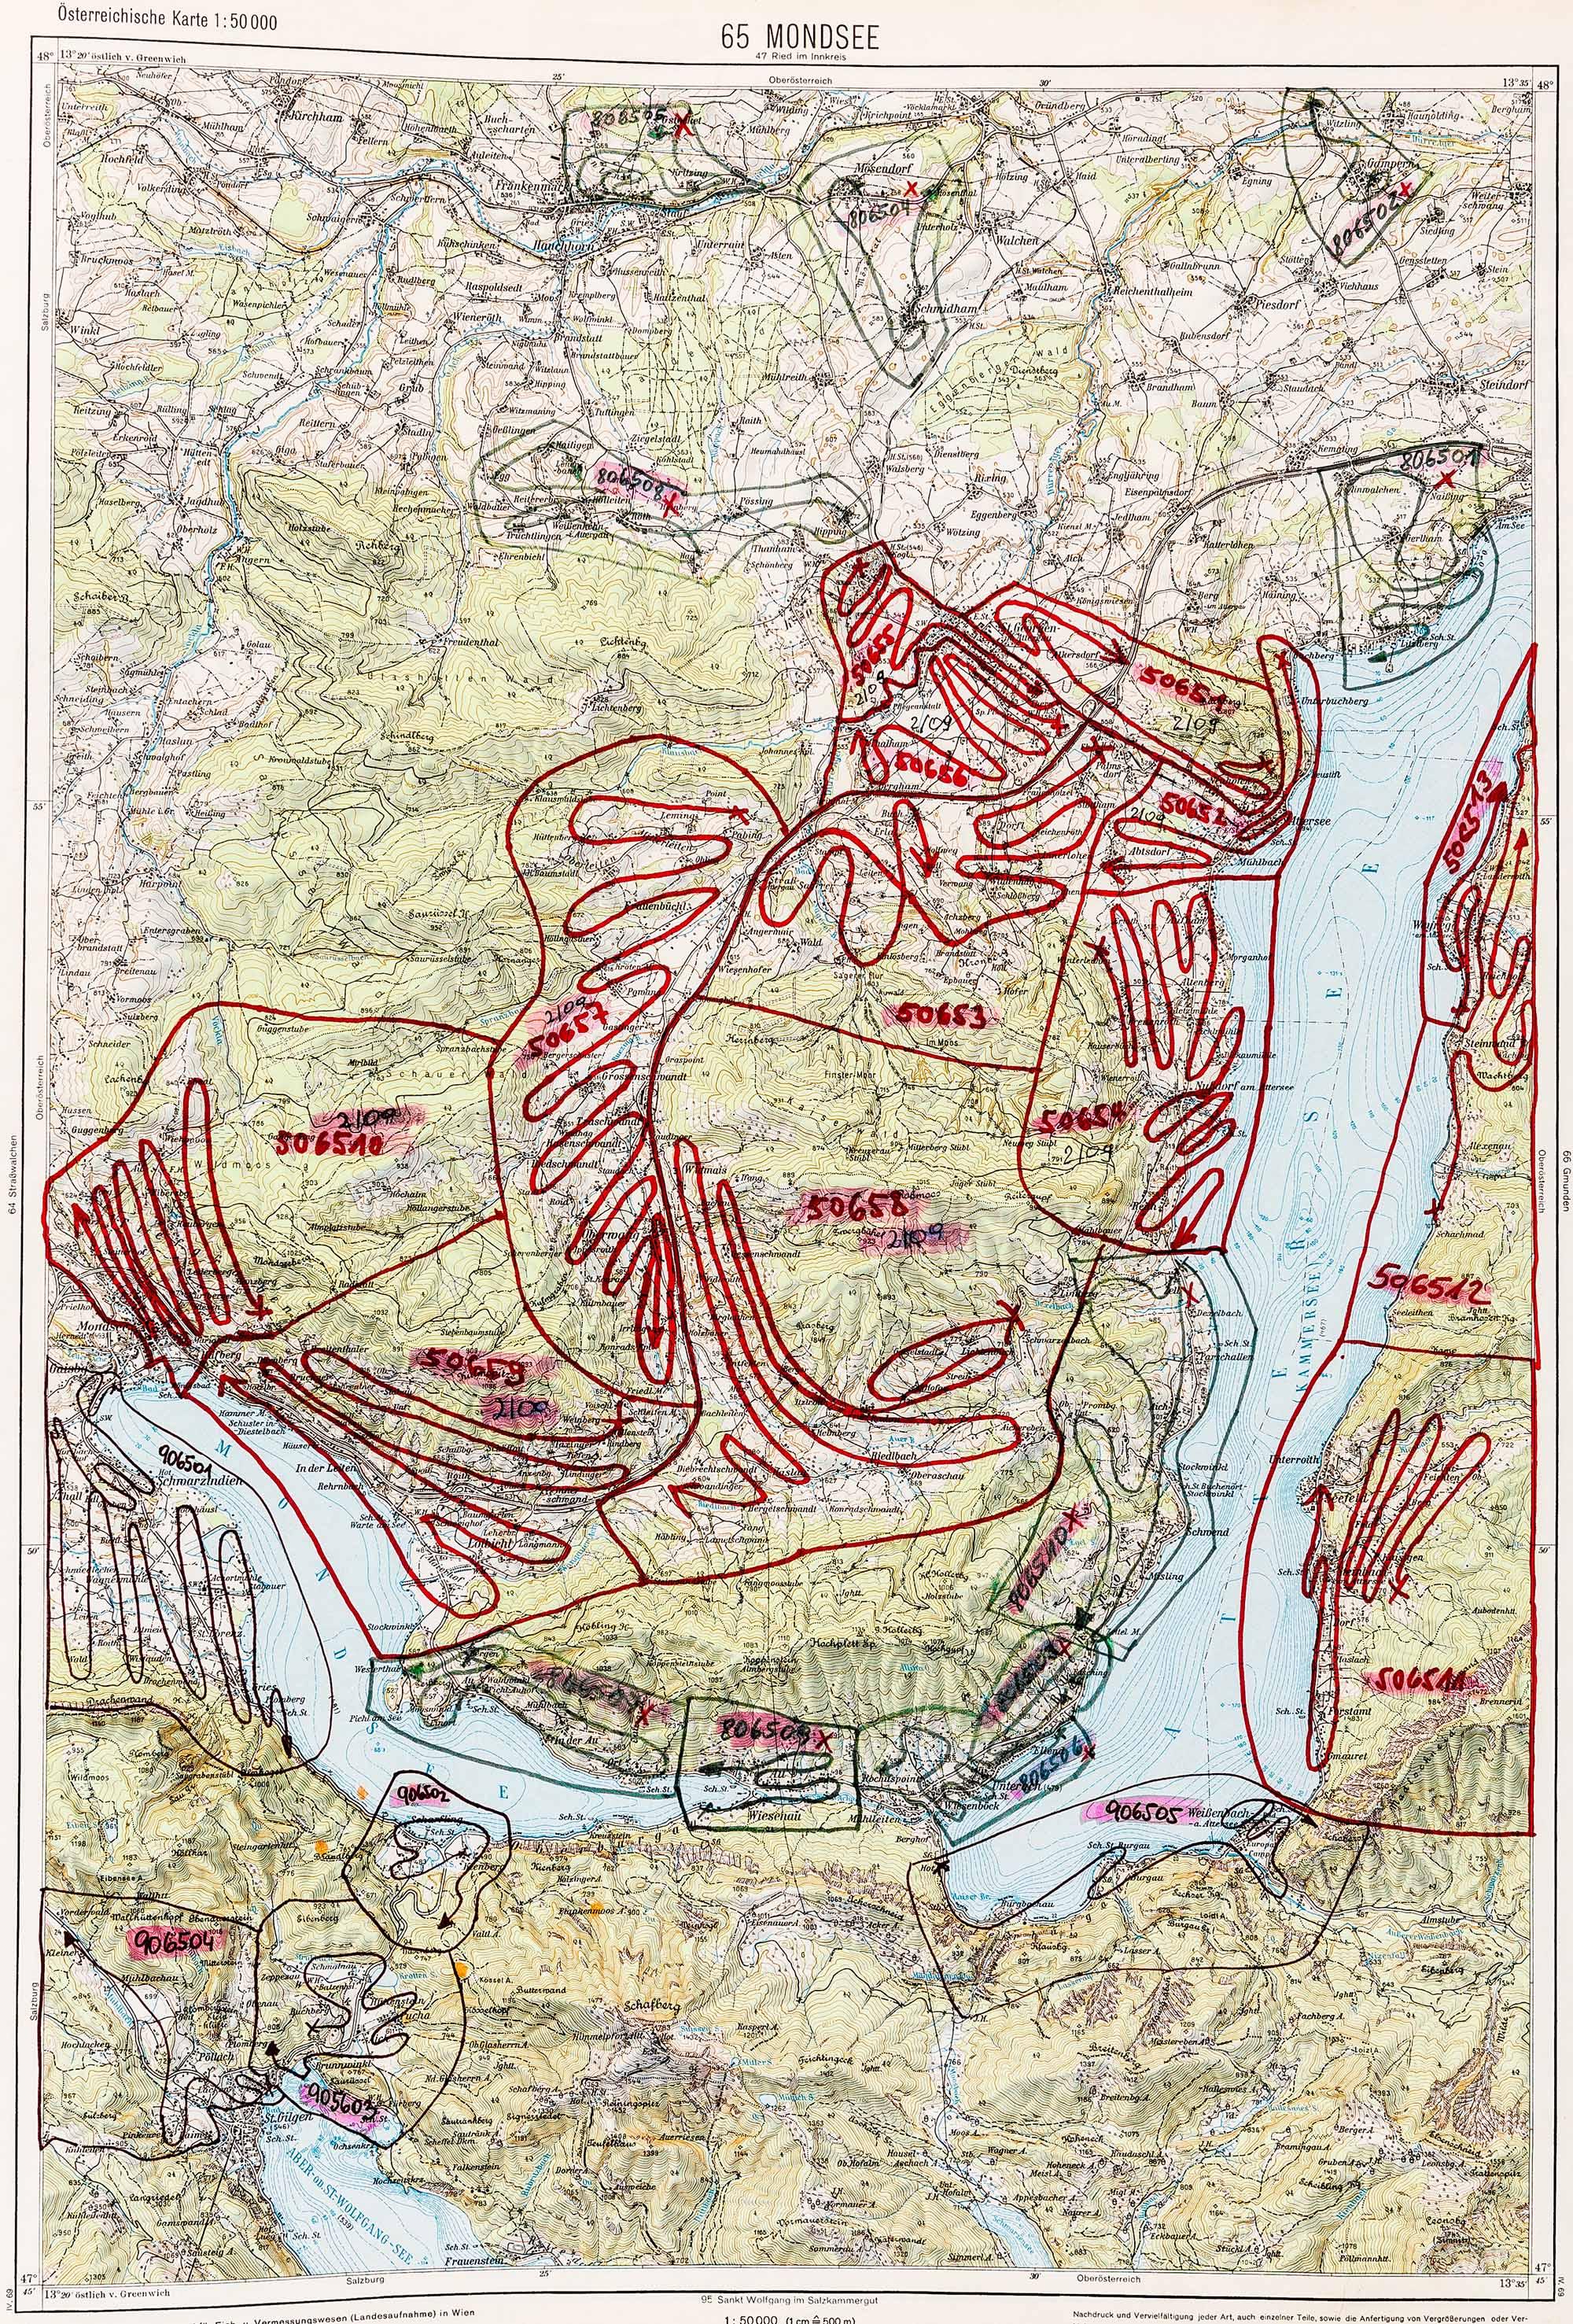 1975-1979 Karte 065